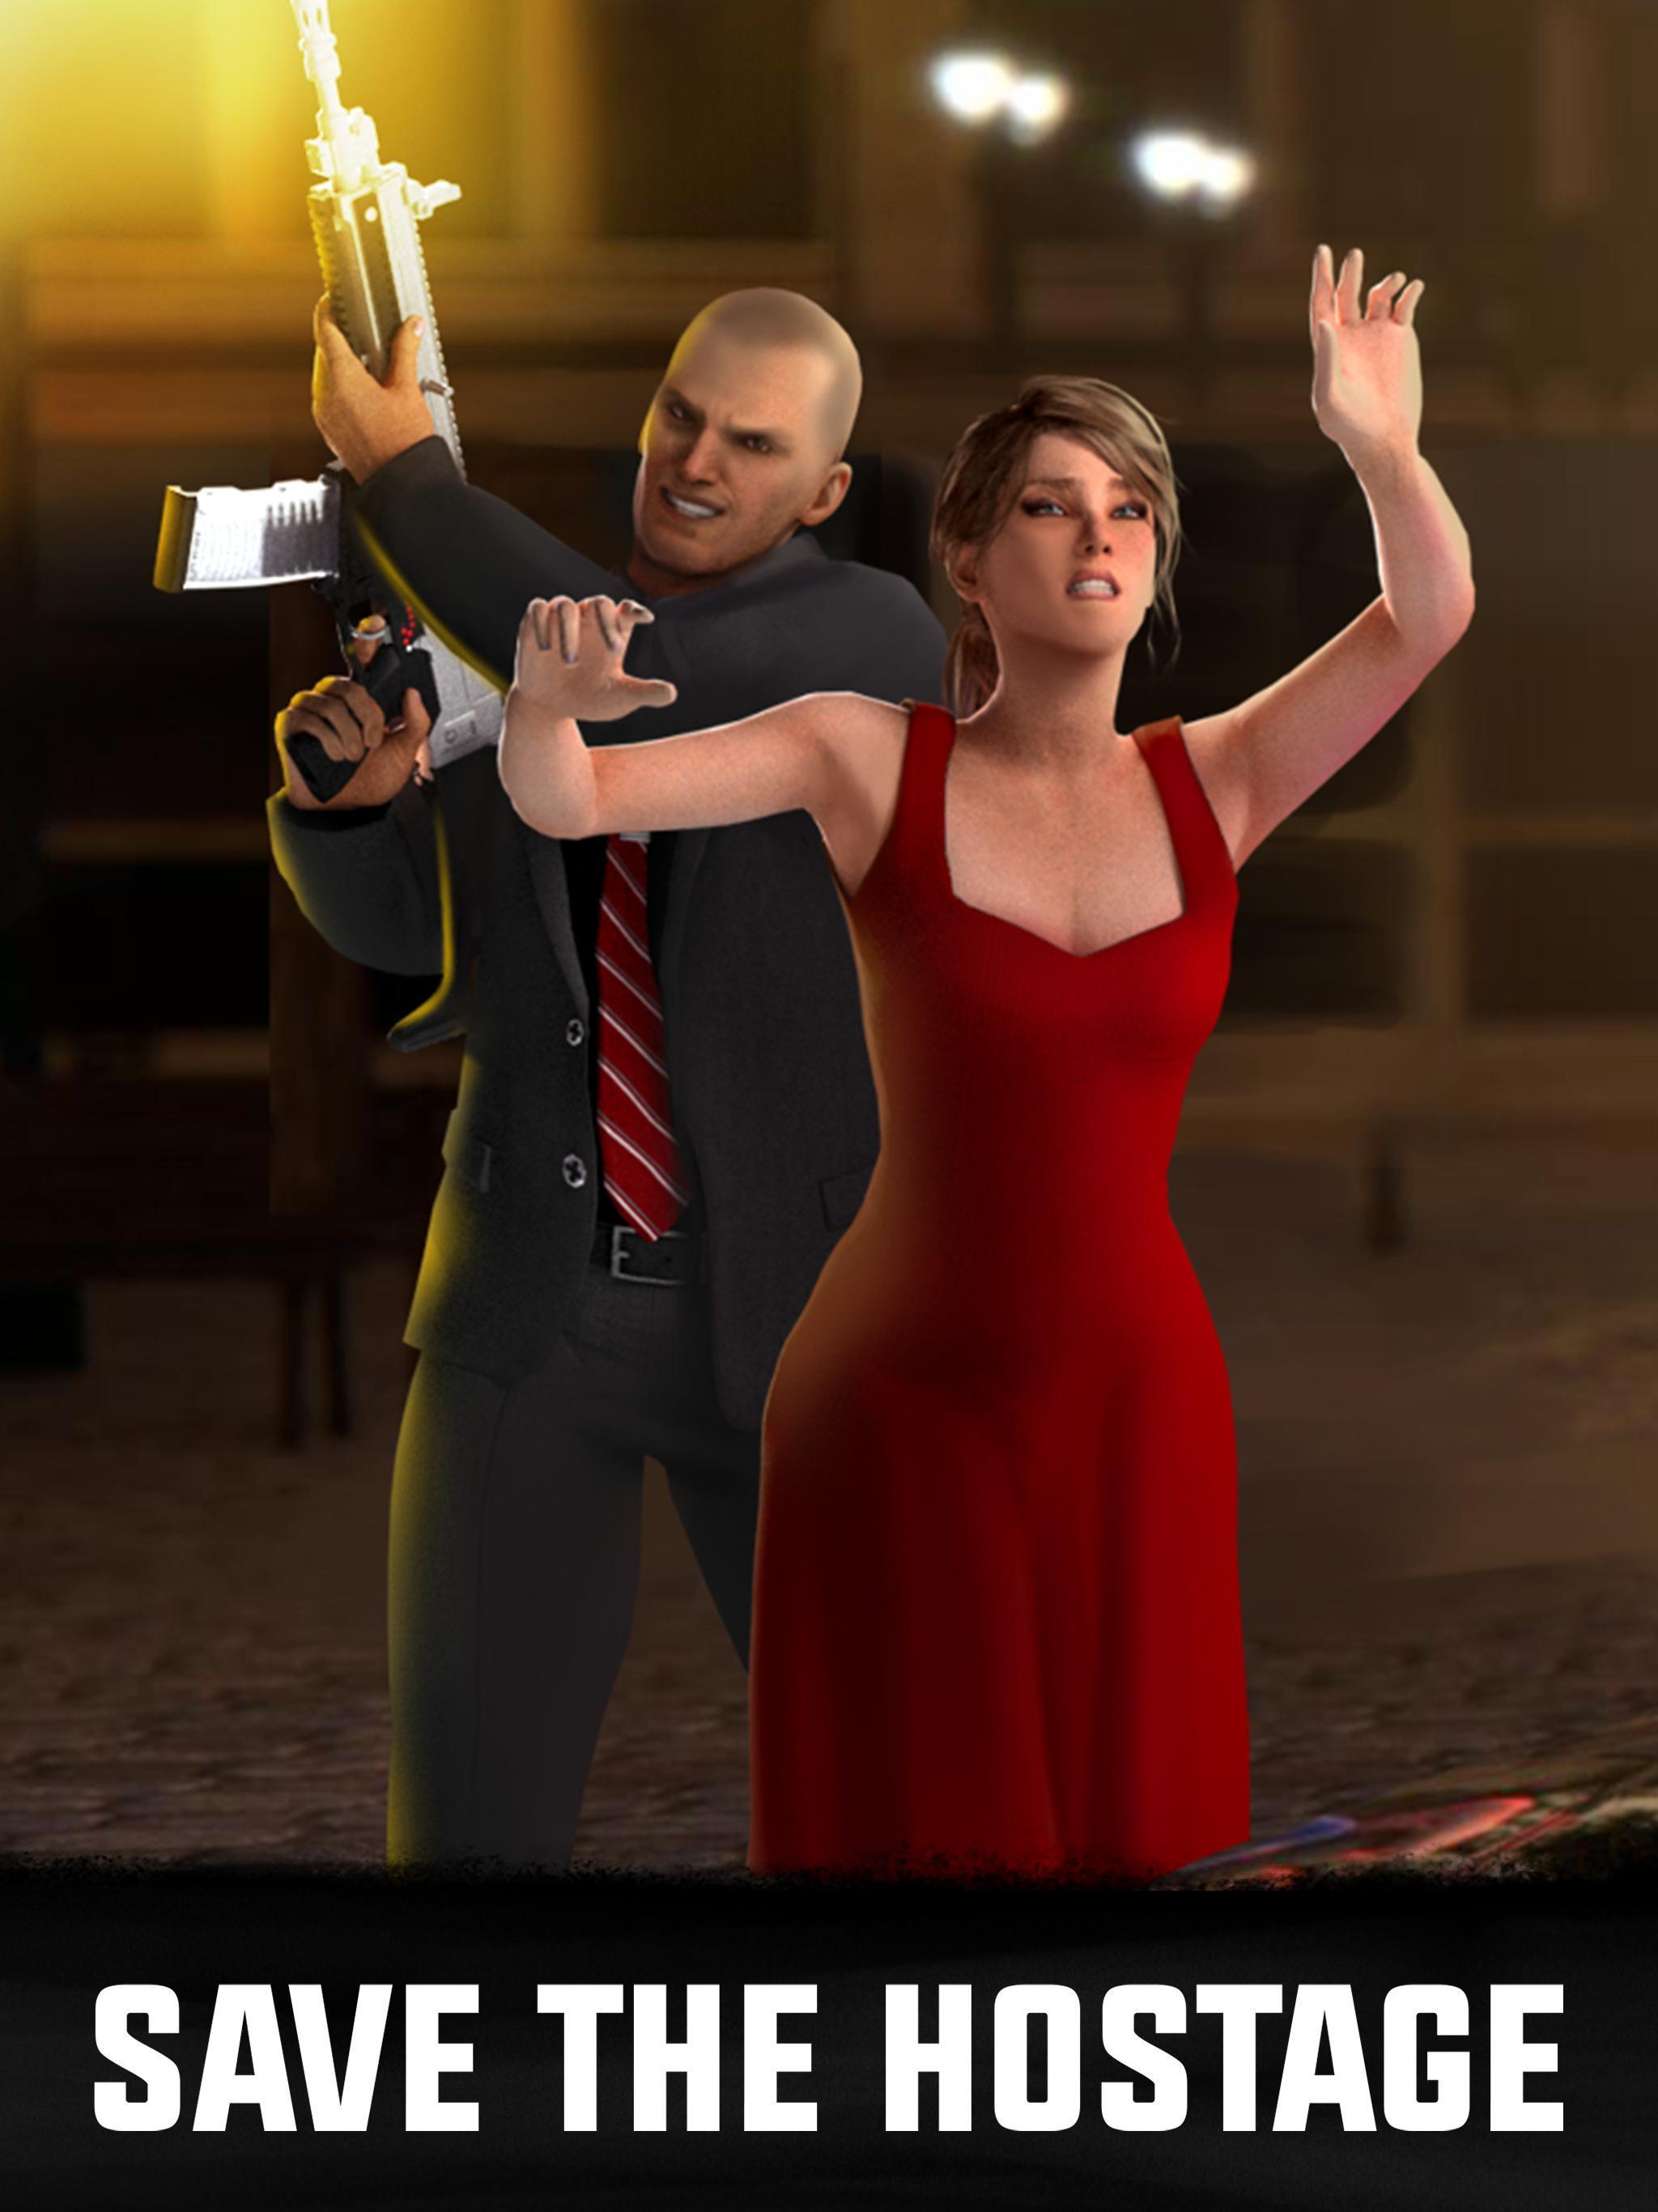 Sniper 3D Fun Free Online FPS Shooting Game 3.15.1 Screenshot 17